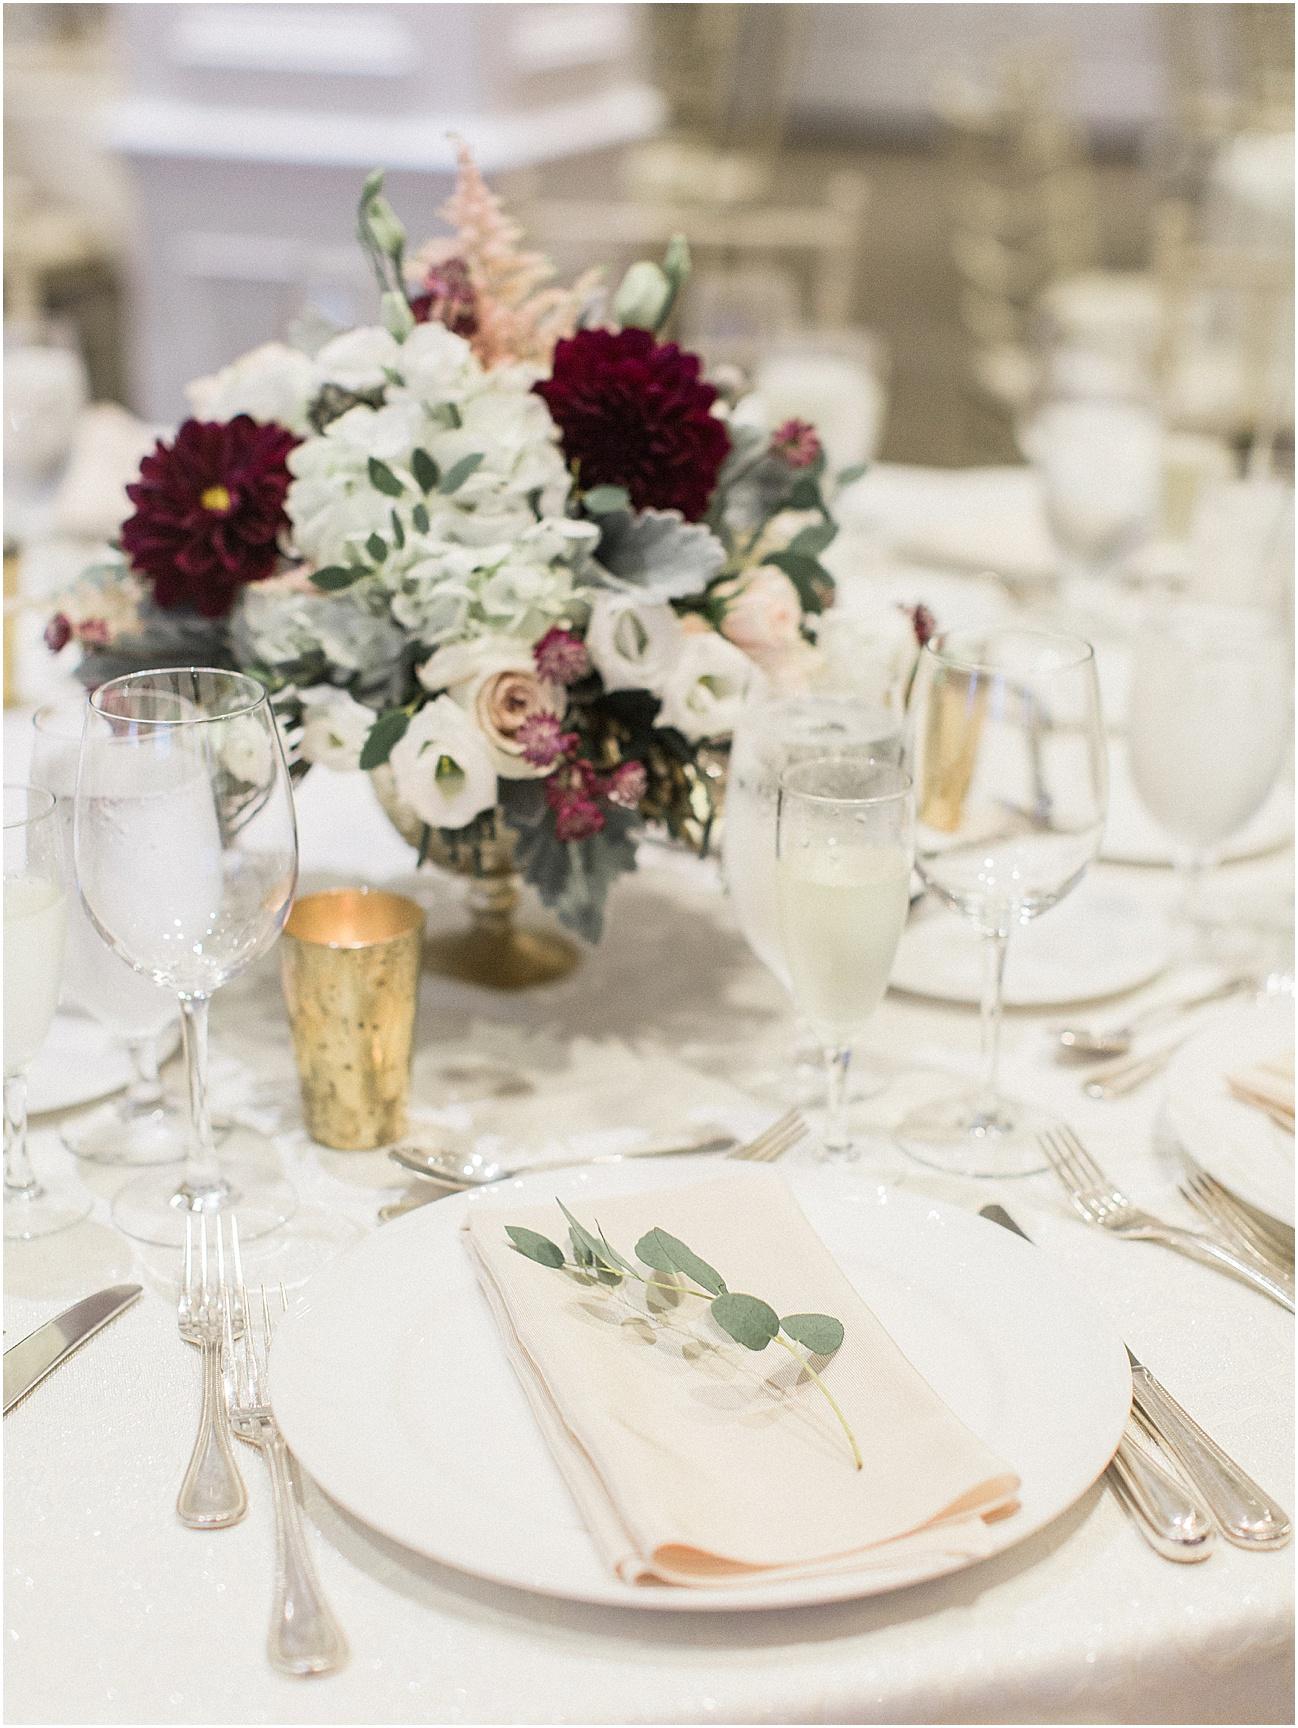 danielle_sean_willowbend_rain_rainy_day_cape_cod_boston_wedding_photographer_meredith_jane_photography_photo_1687.jpg